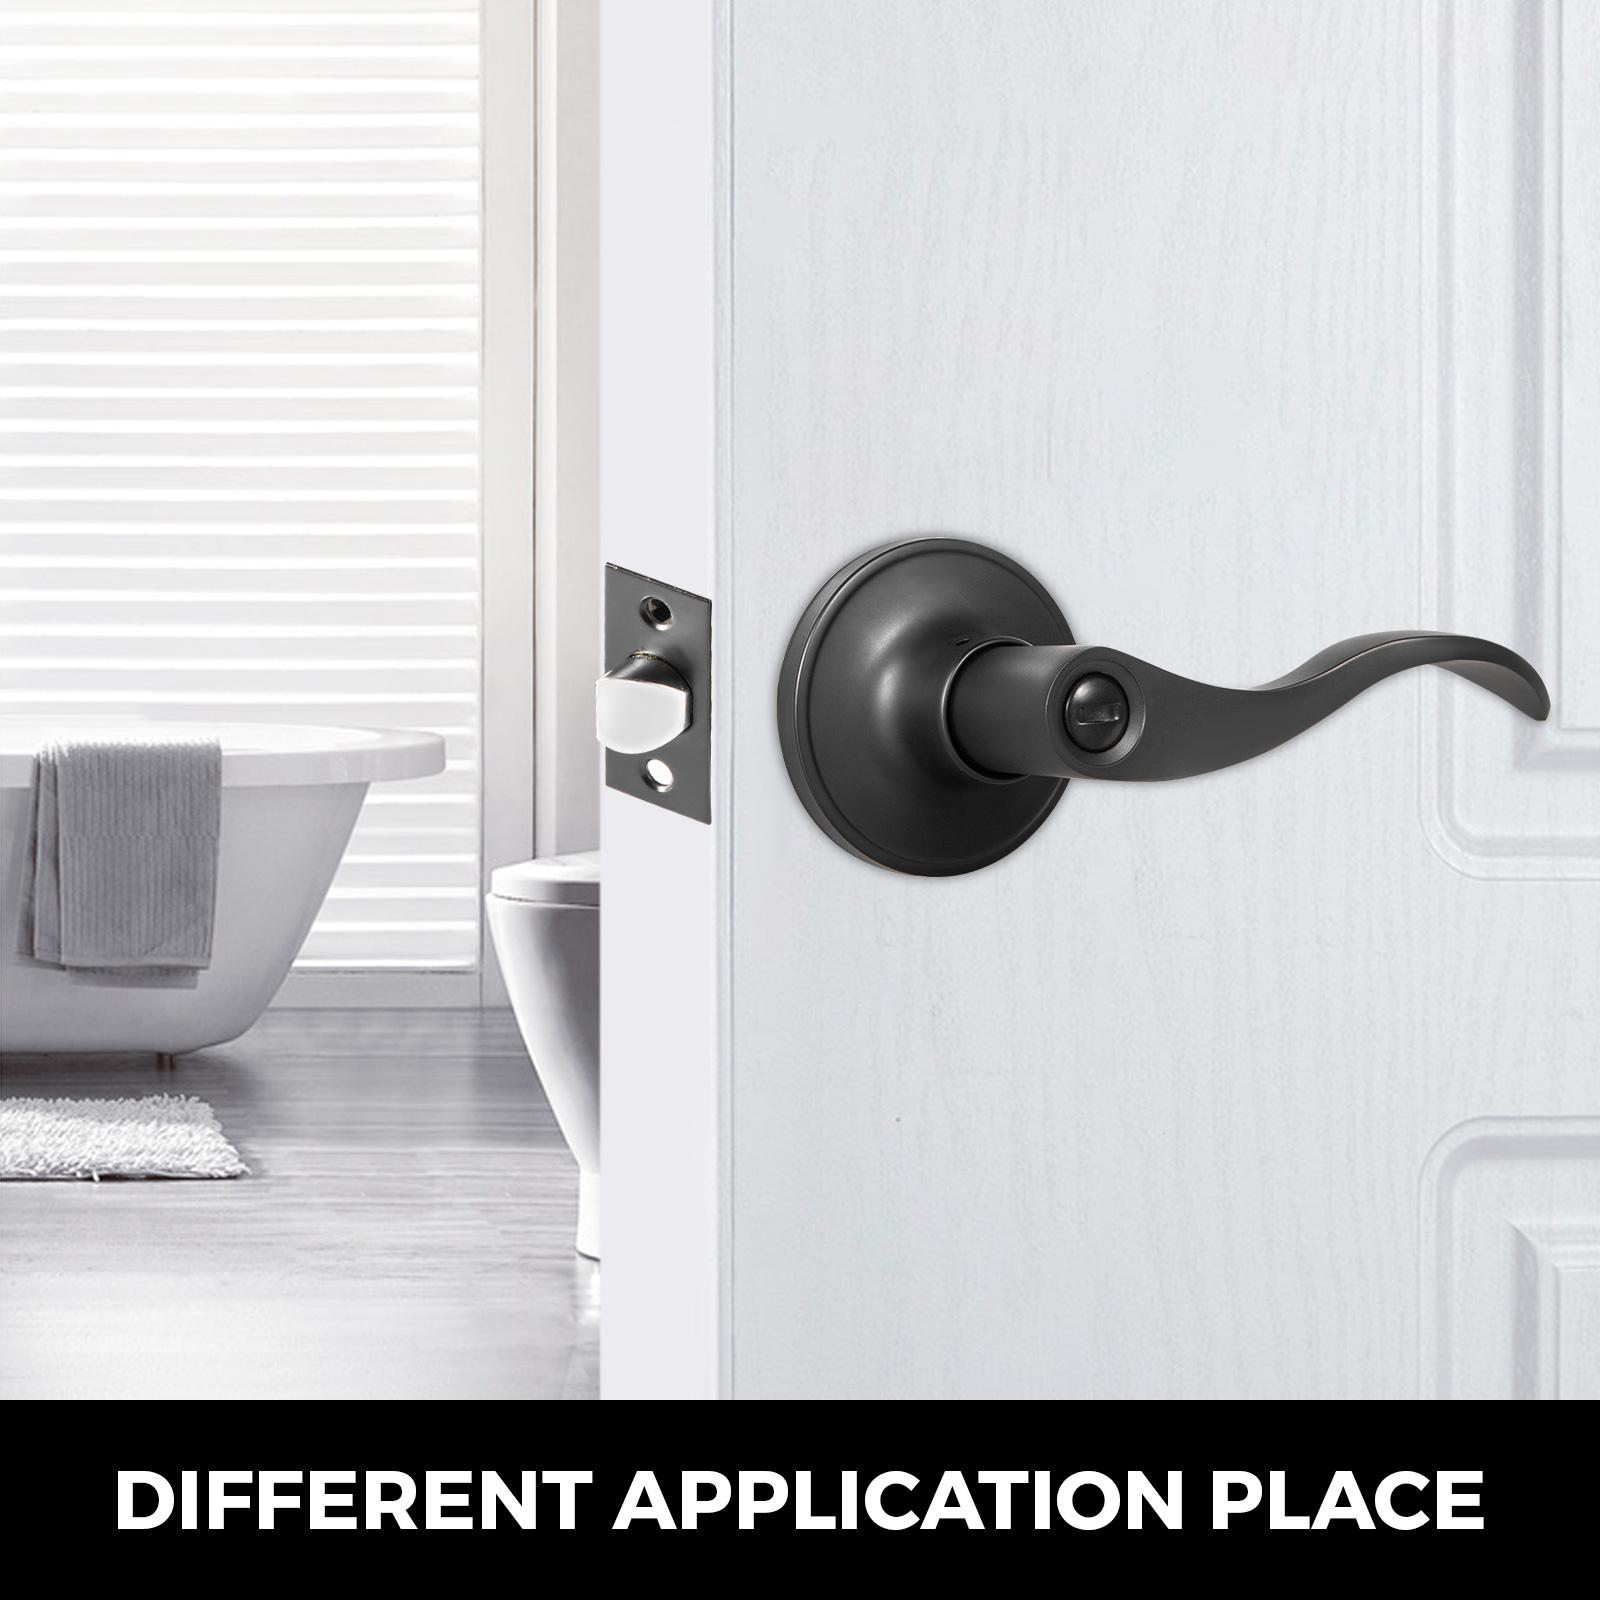 Door-Handles-Matte-Black-Door-Lever-3-5-10-Pack-Passage-Privace-Entry-Lock-Set thumbnail 115